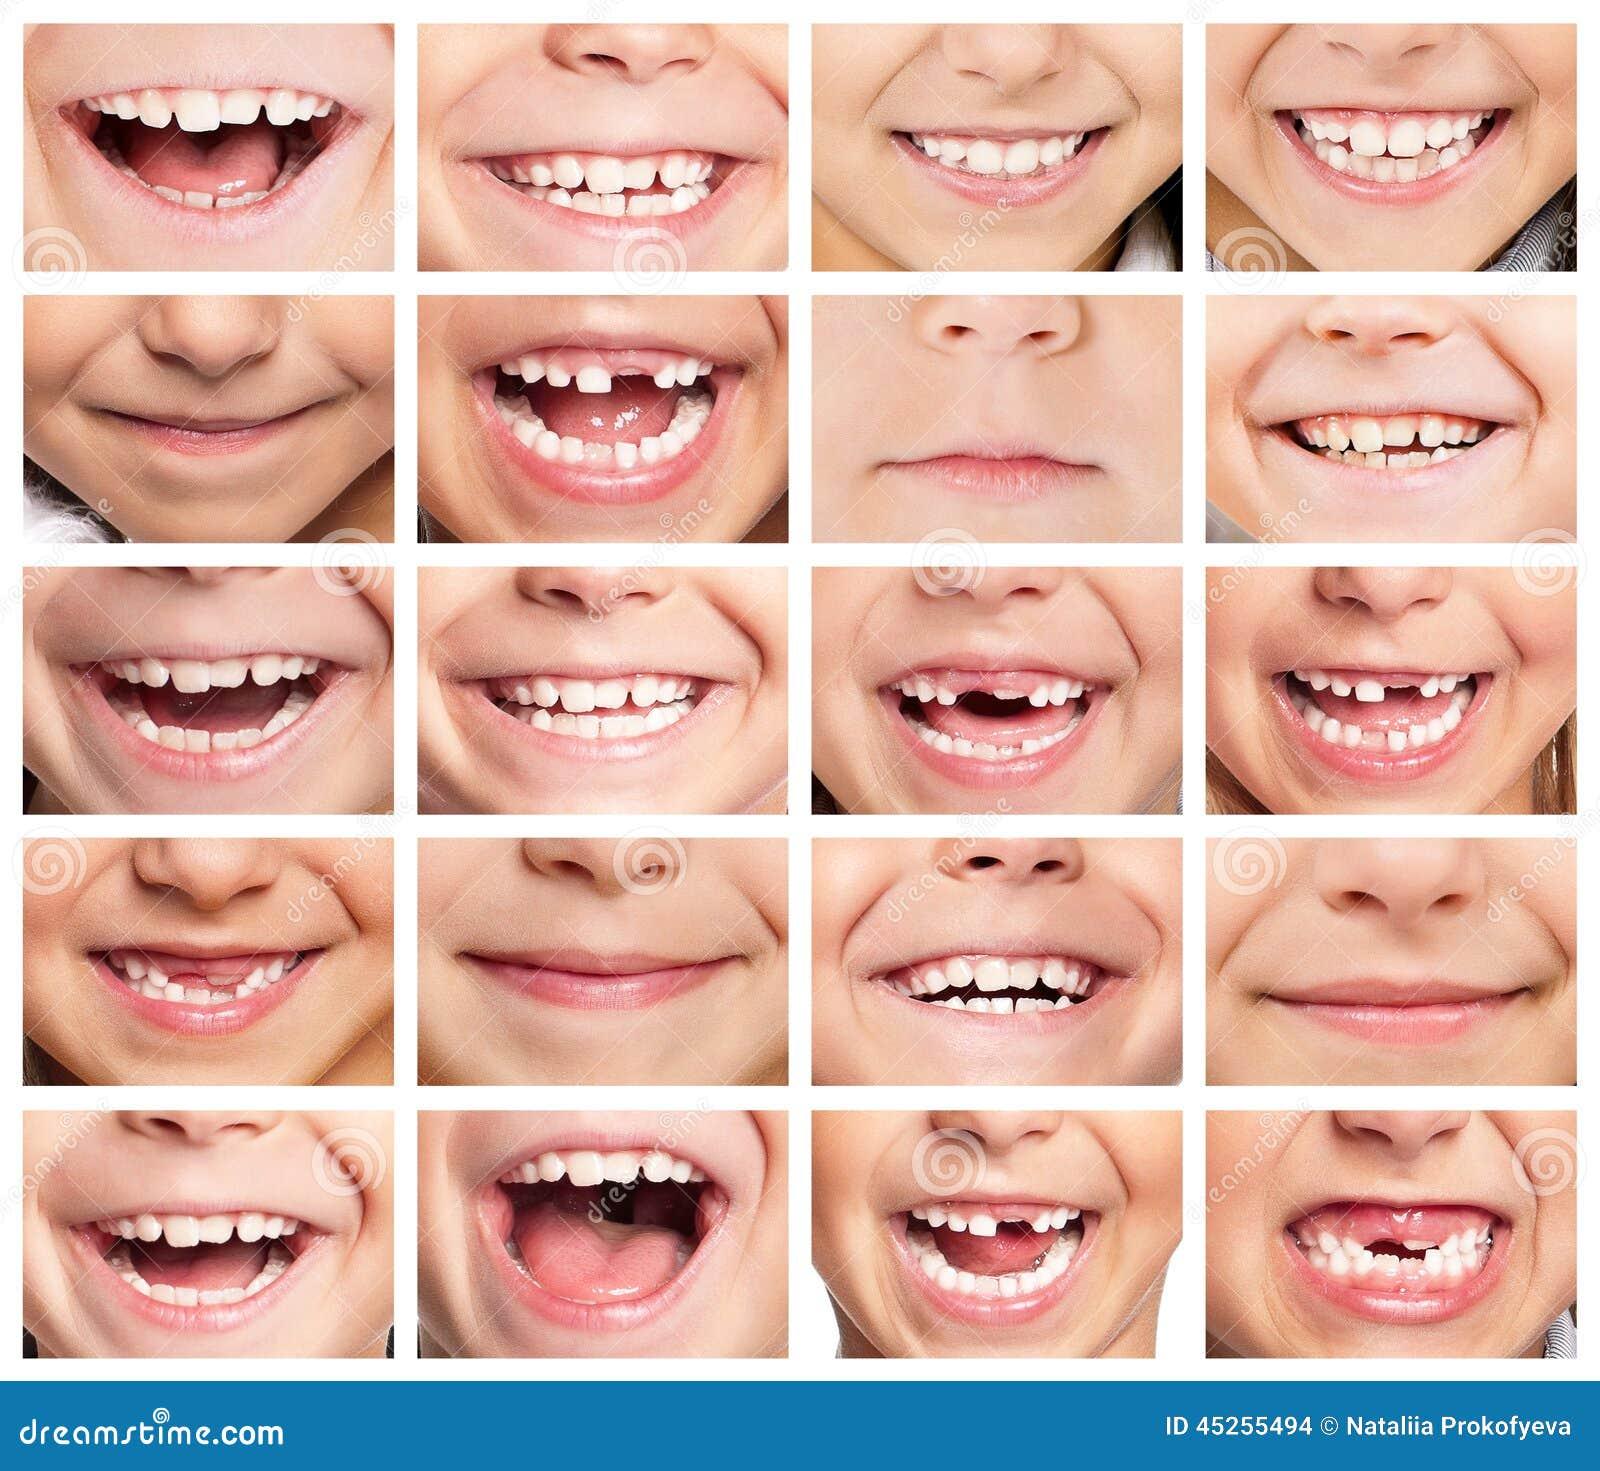 perfect smile veneers купить в железнодорожном